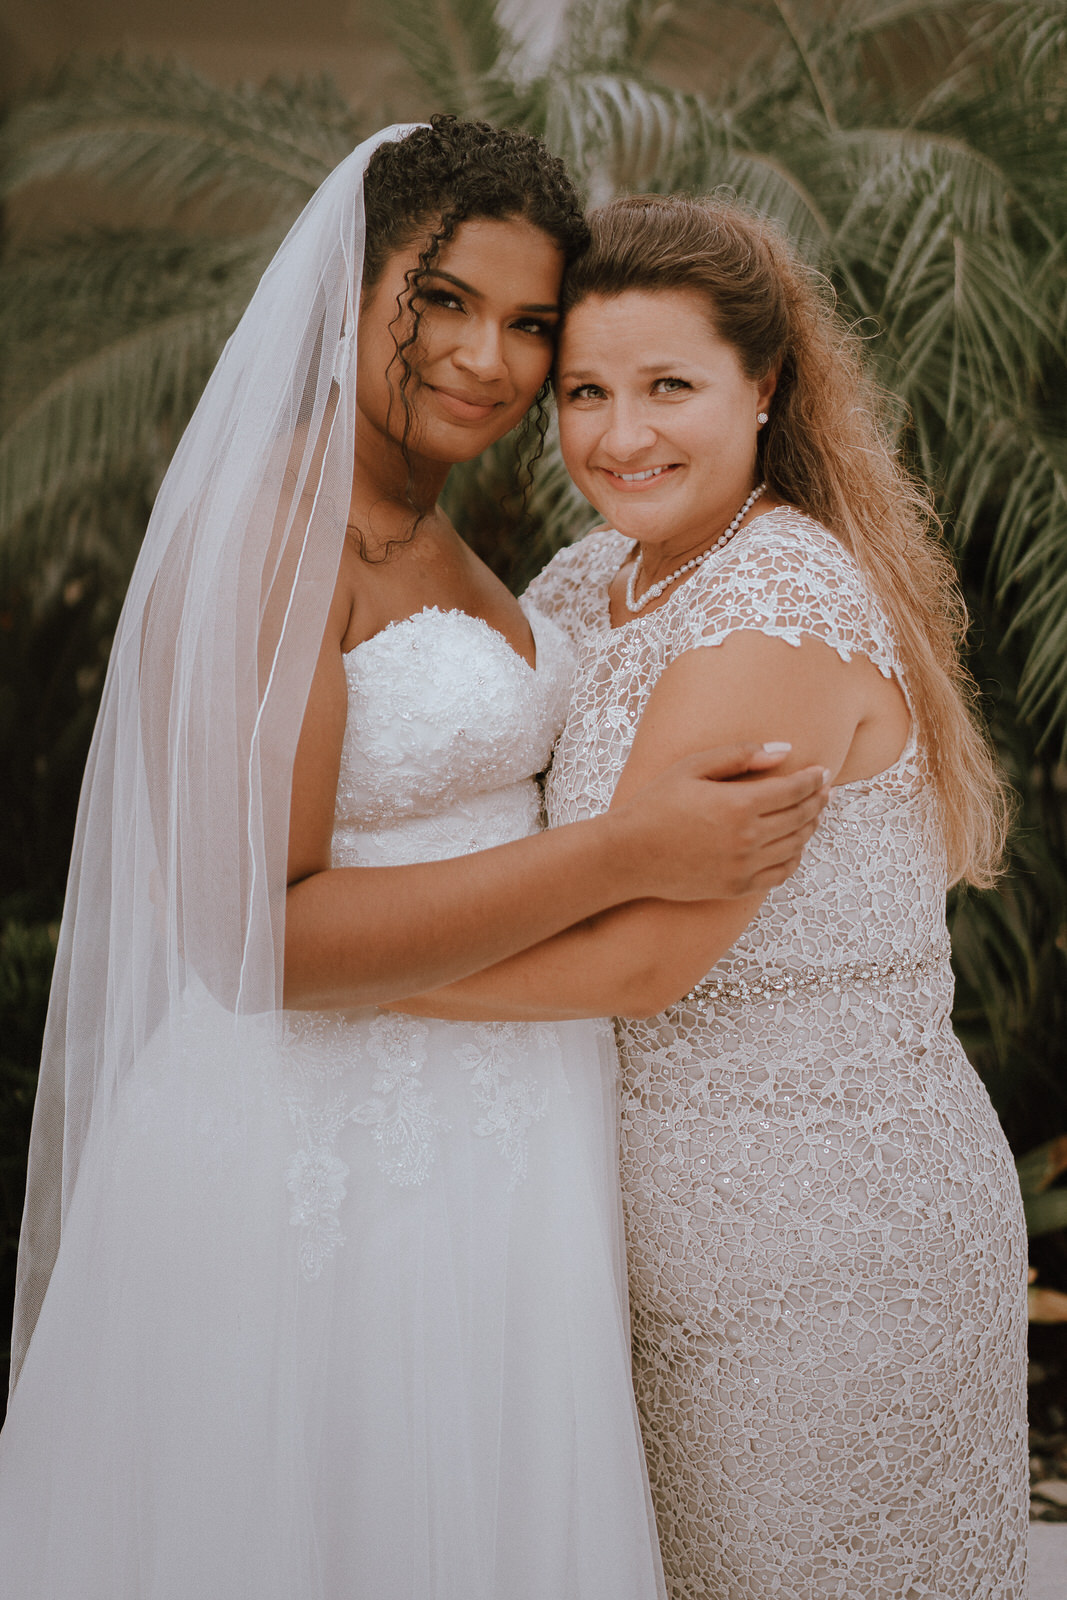 South Seas Island Resort Elopement- Alyana and Shawn- Michelle Gonzalez Photography-344.JPG